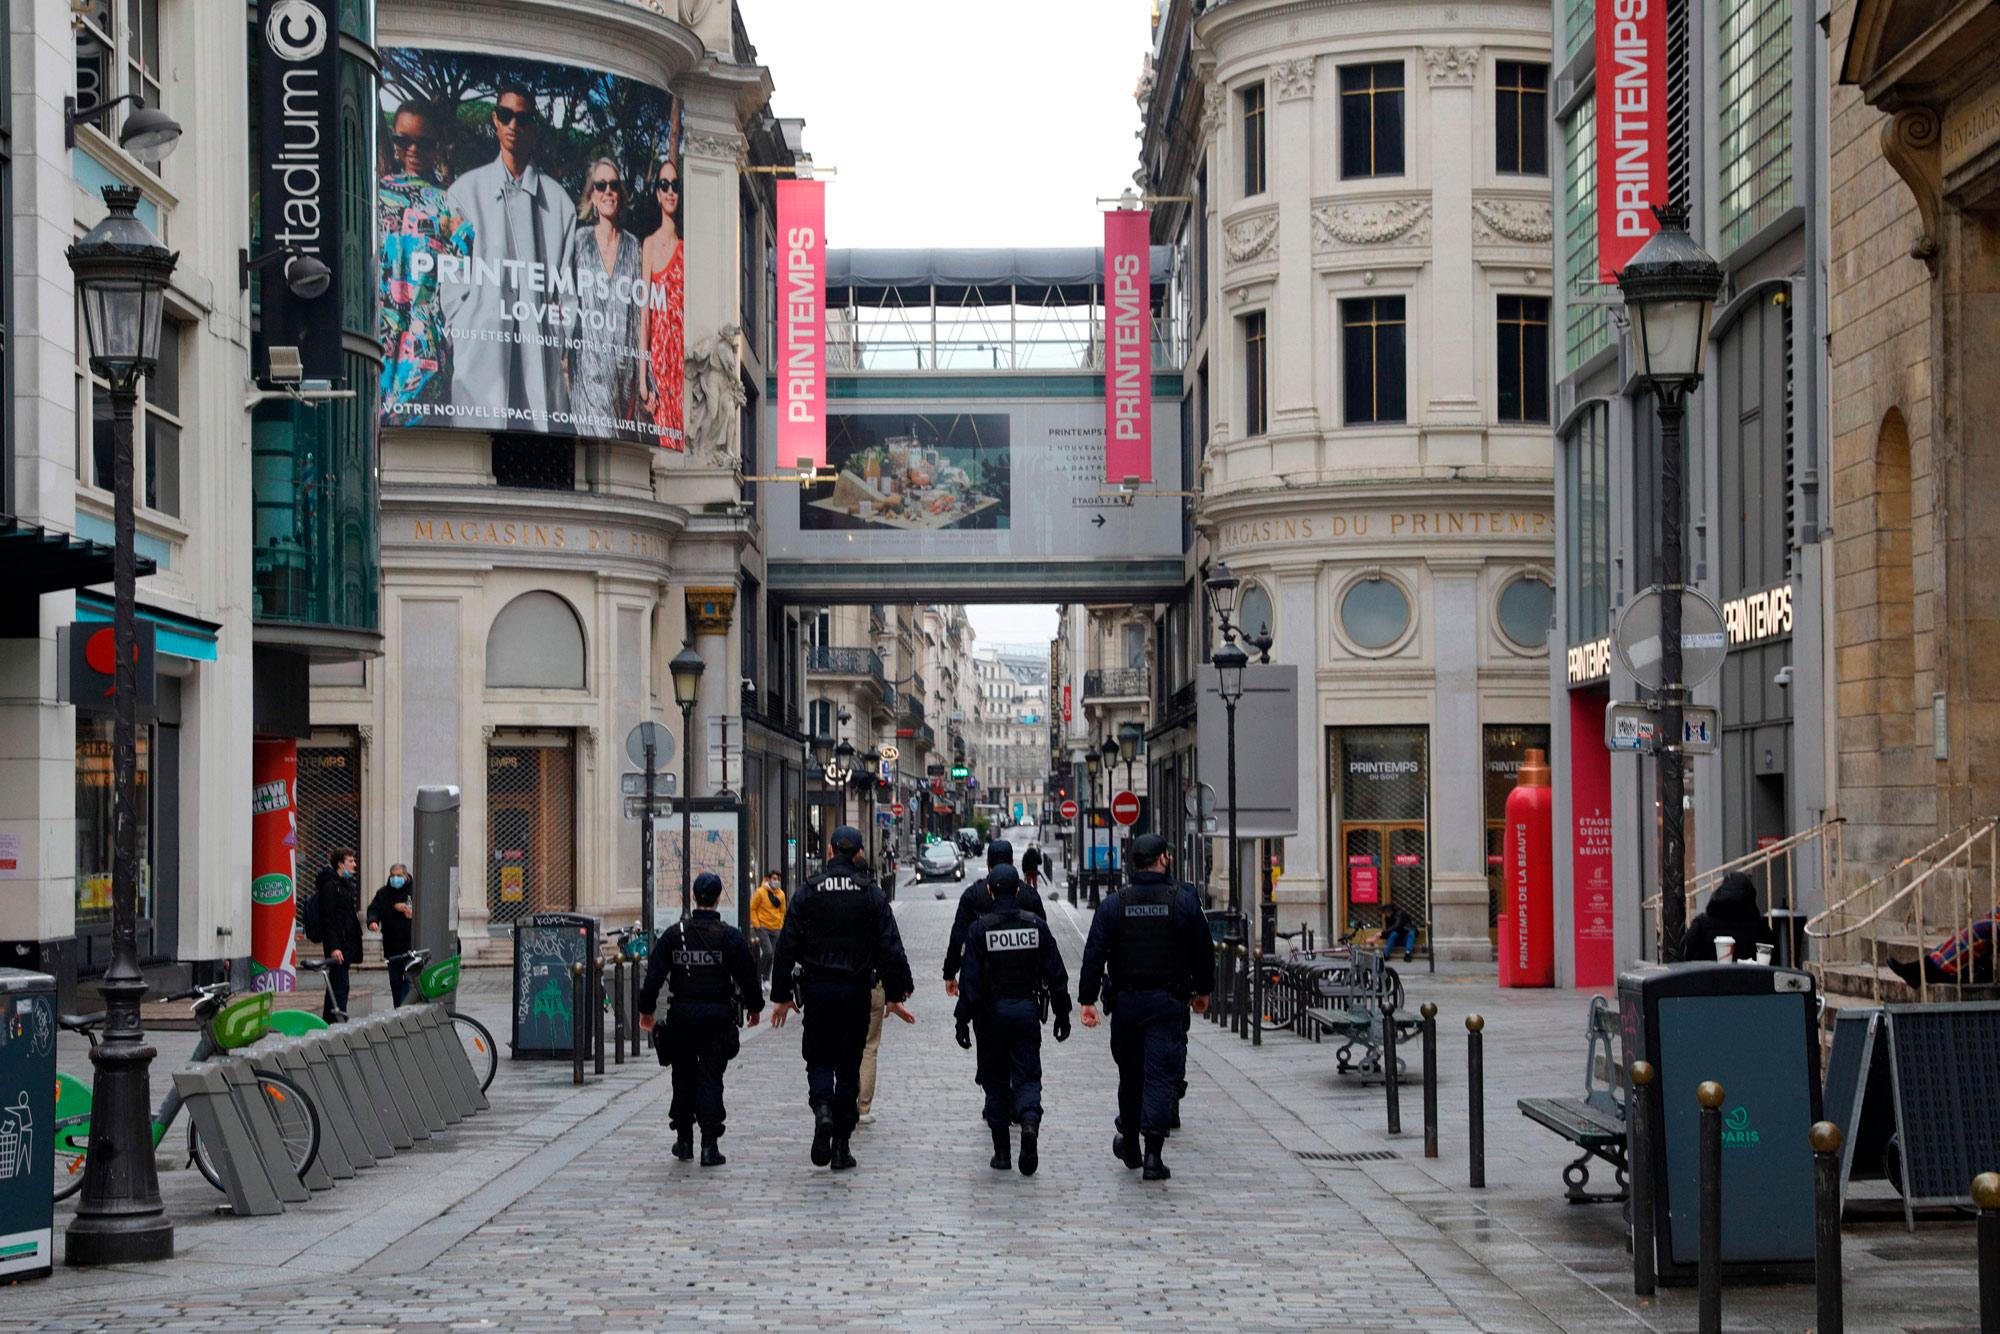 Policemen patrol near Le Printemps shopping center in Paris on January 31.